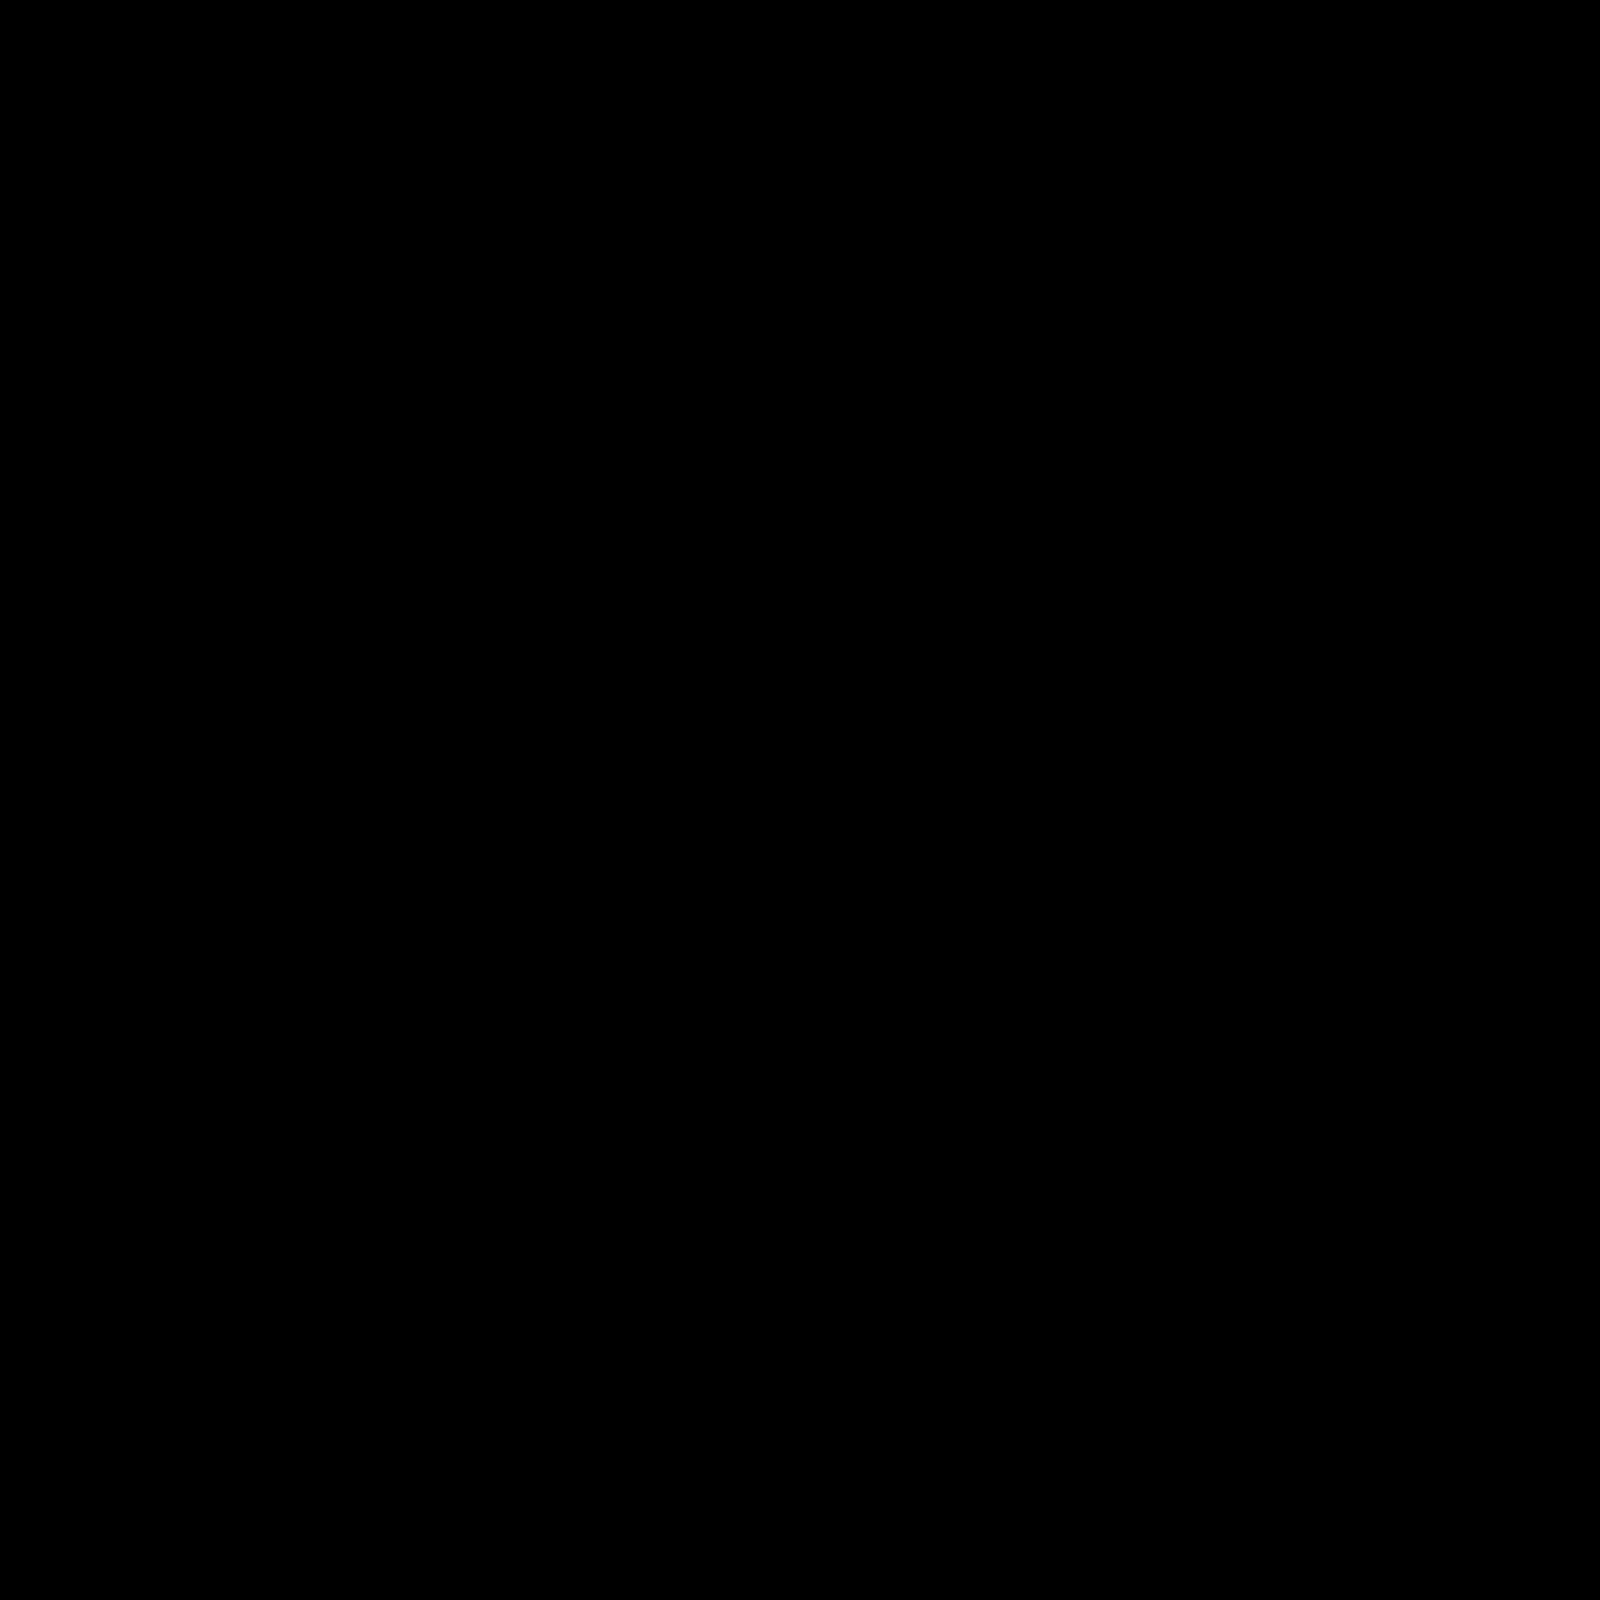 Instagram Icon And Instagram Logo Symbol Emblem Free Download Free Transparent Png Logos